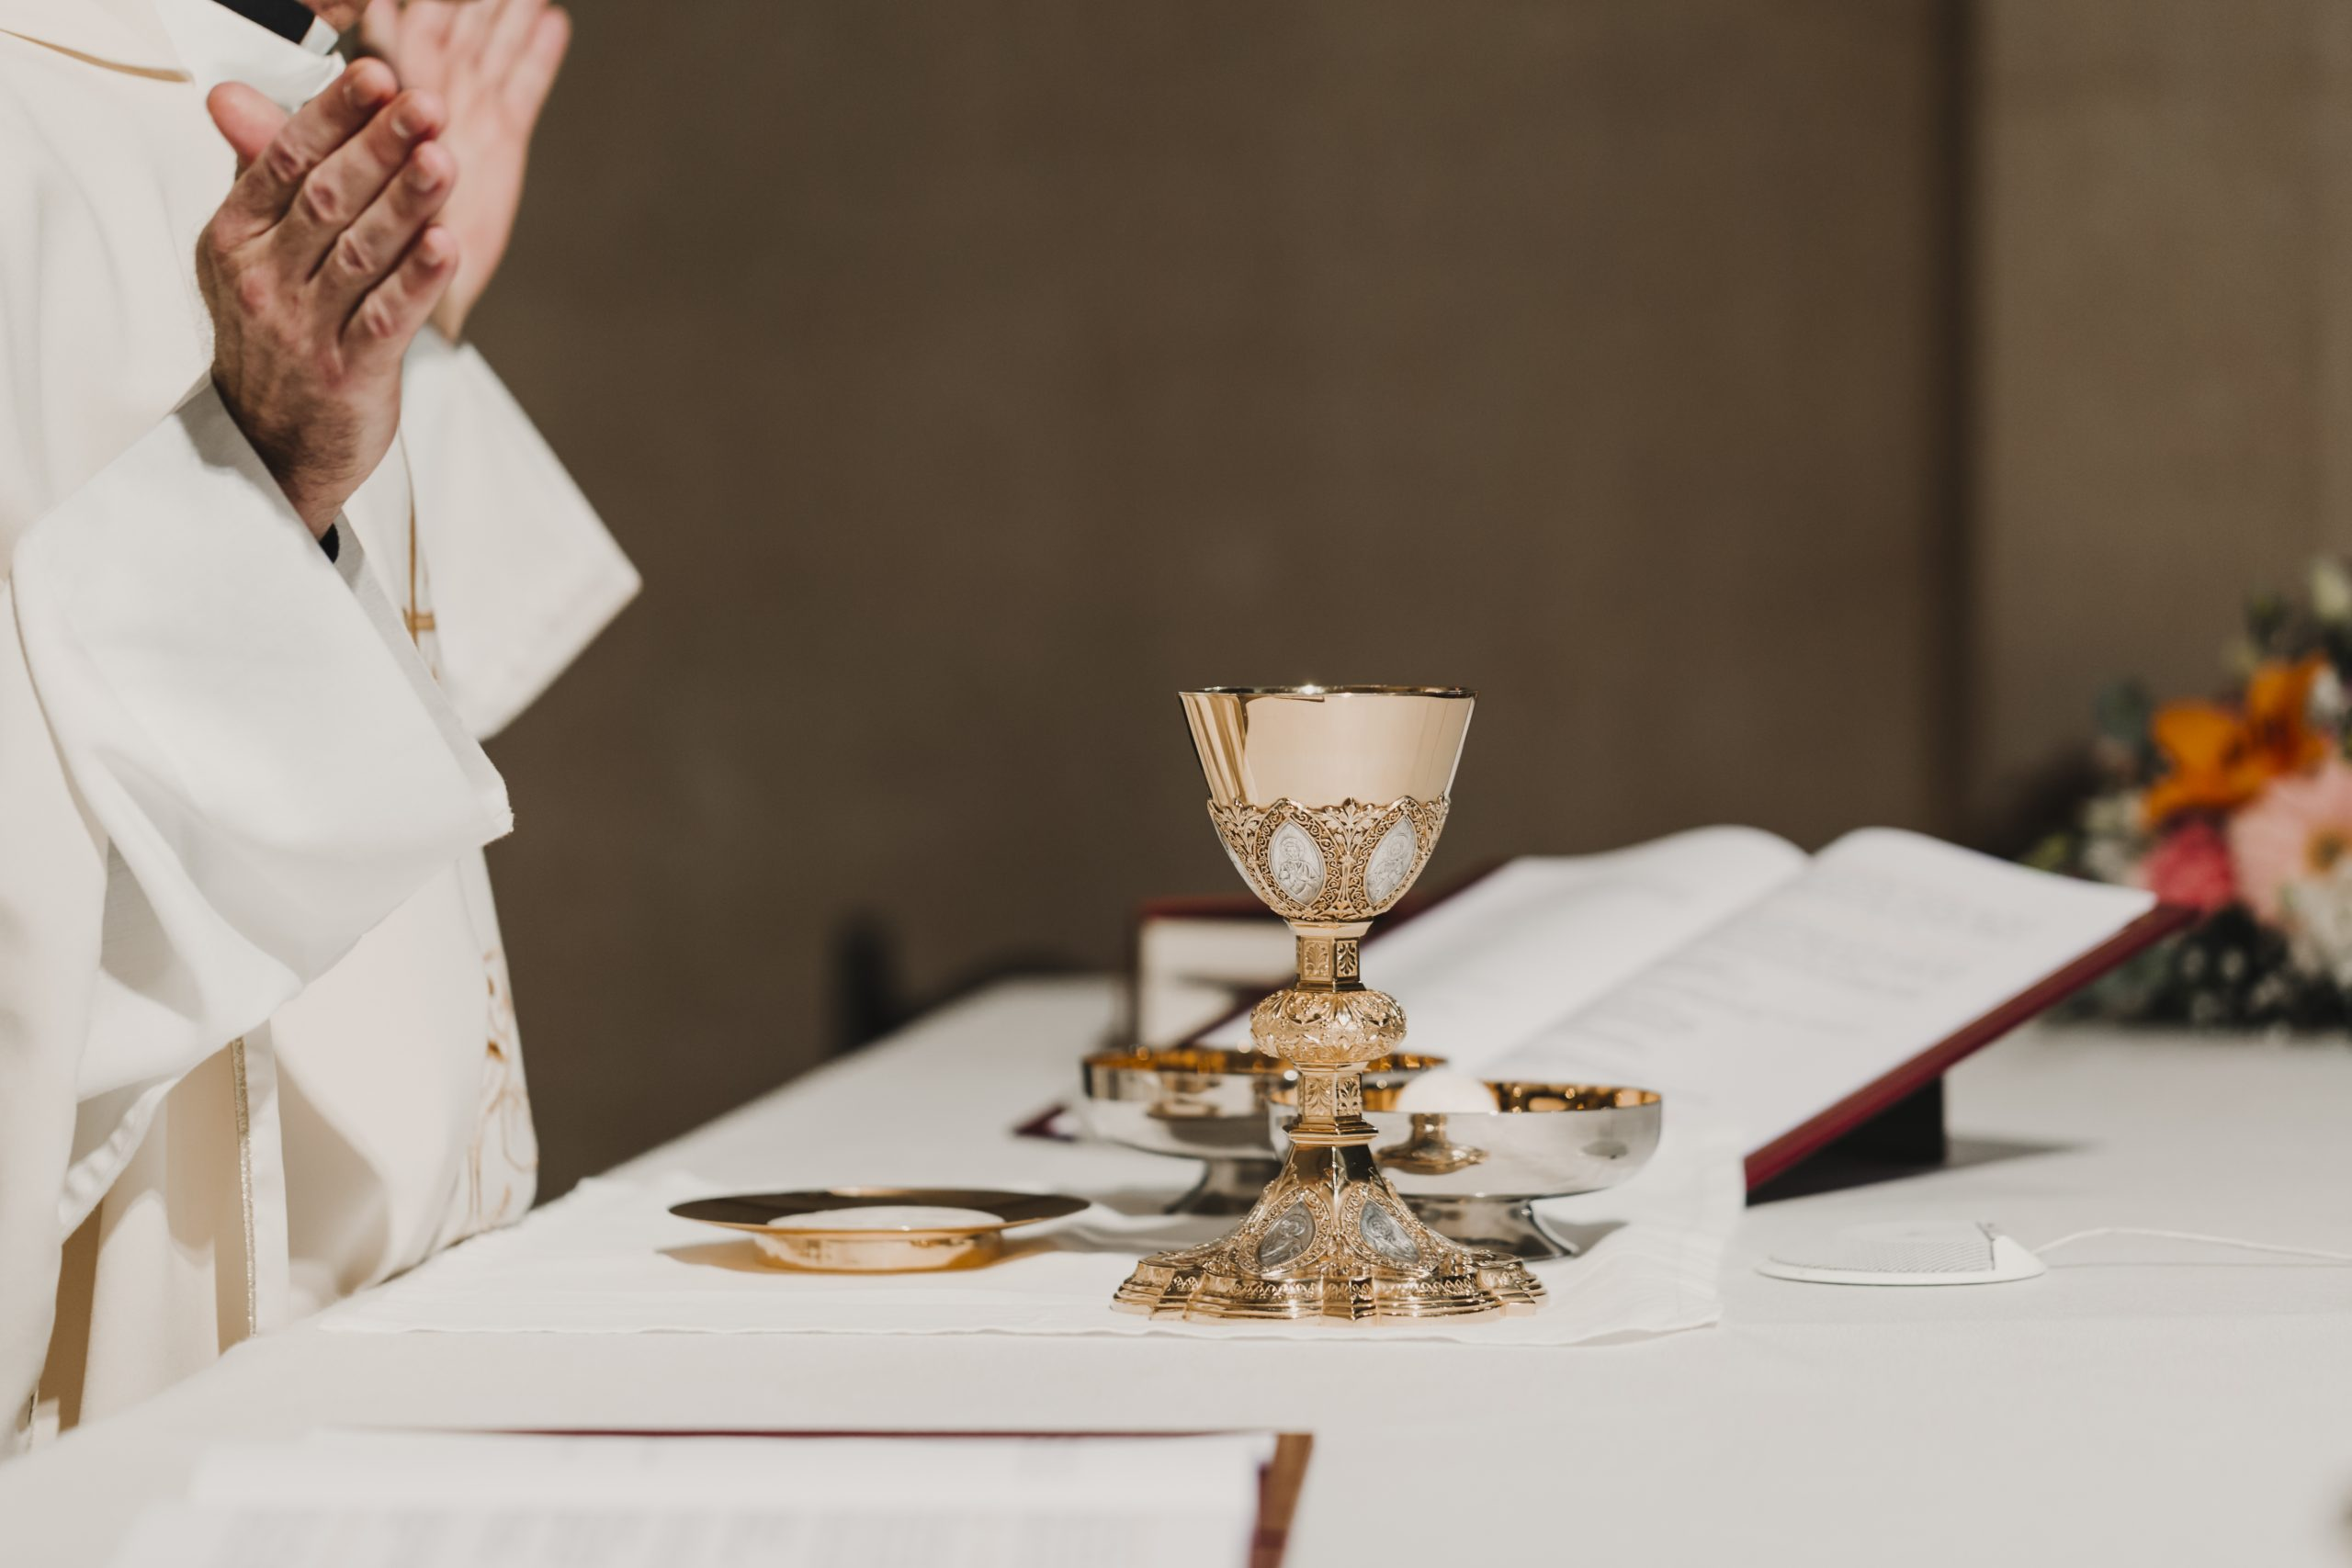 PASSION SUNDAY MASS AND HOLY TRIDUUM